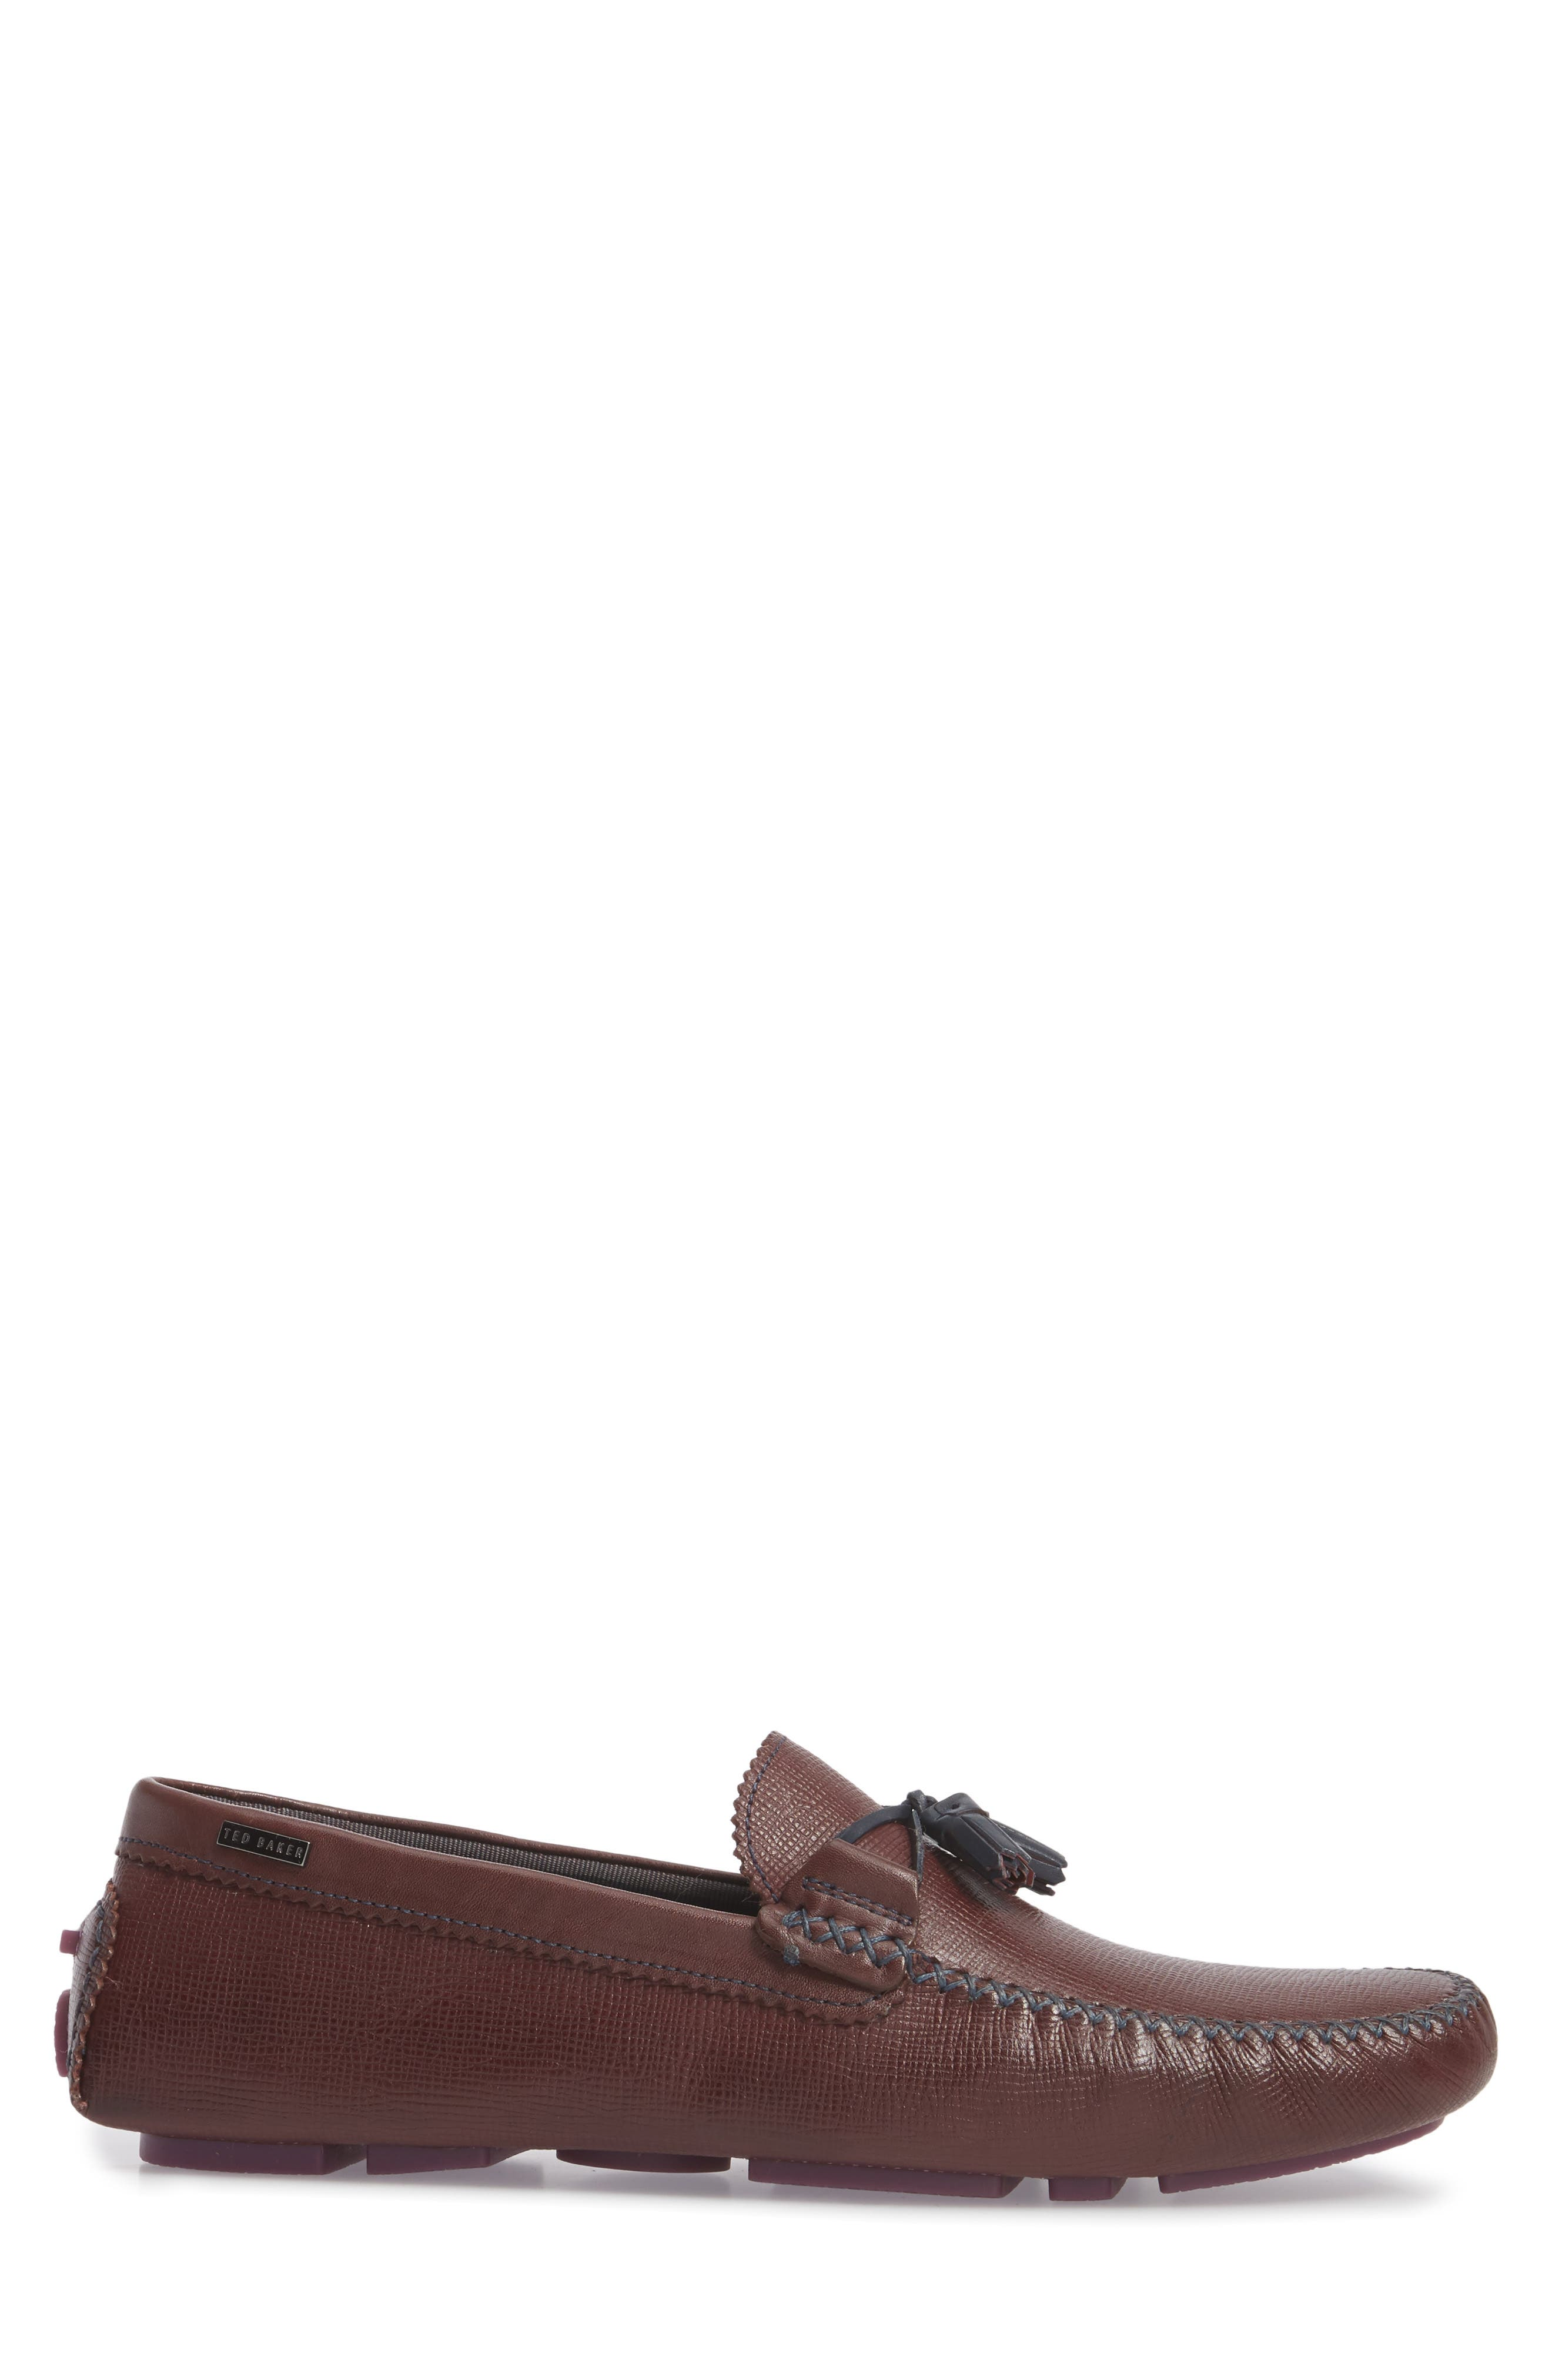 Urbonn Tasseled Driving Loafer,                             Alternate thumbnail 3, color,                             Dark Red Leather